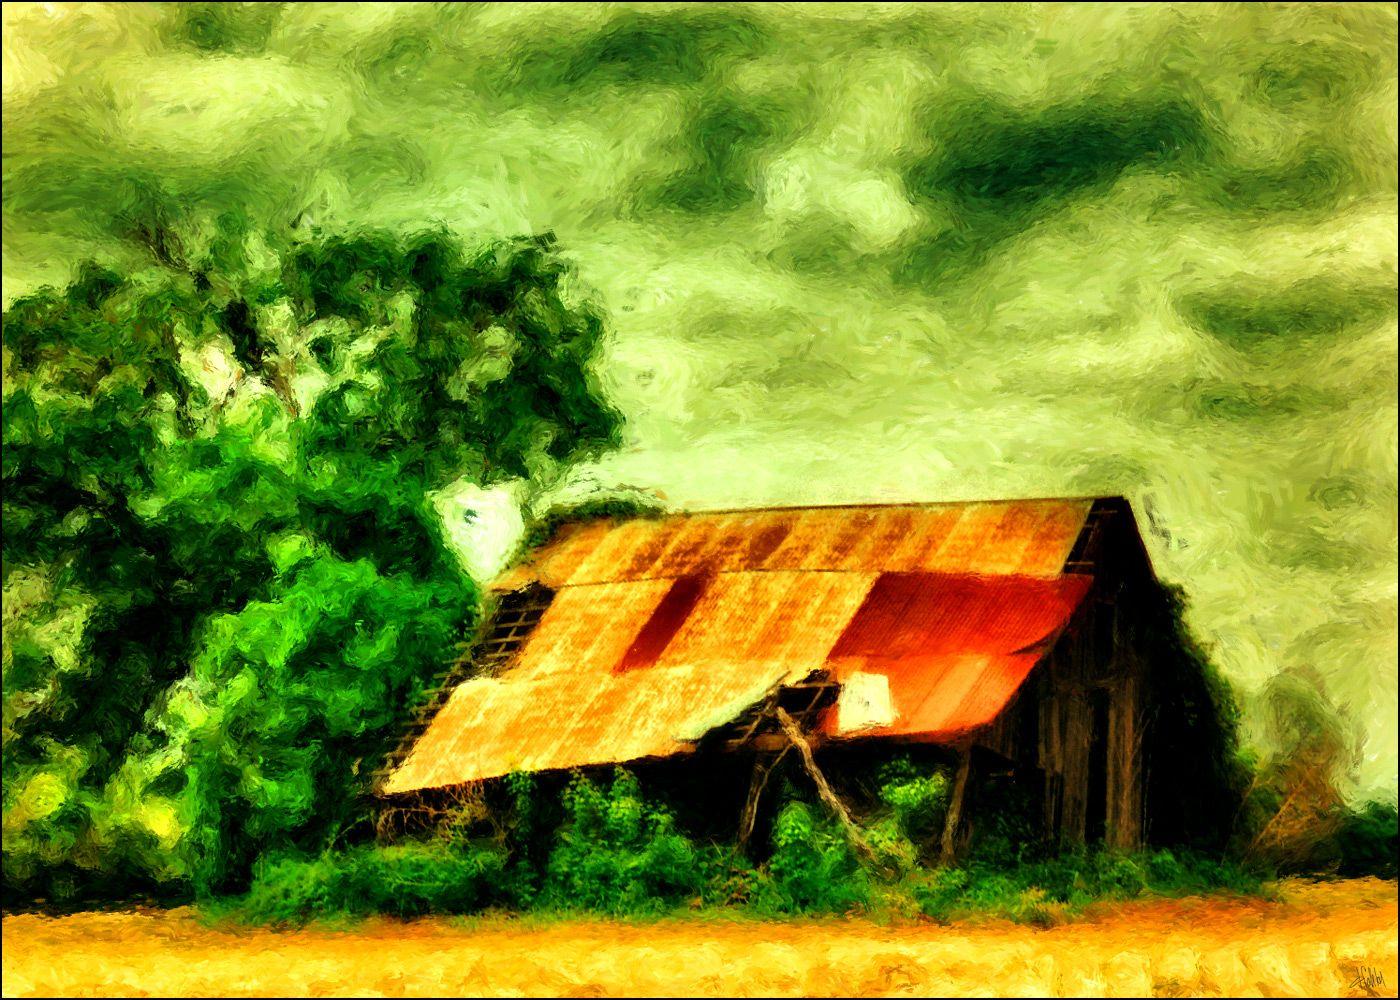 Dennis Fehler - An old barn near Mother Neff State Park.